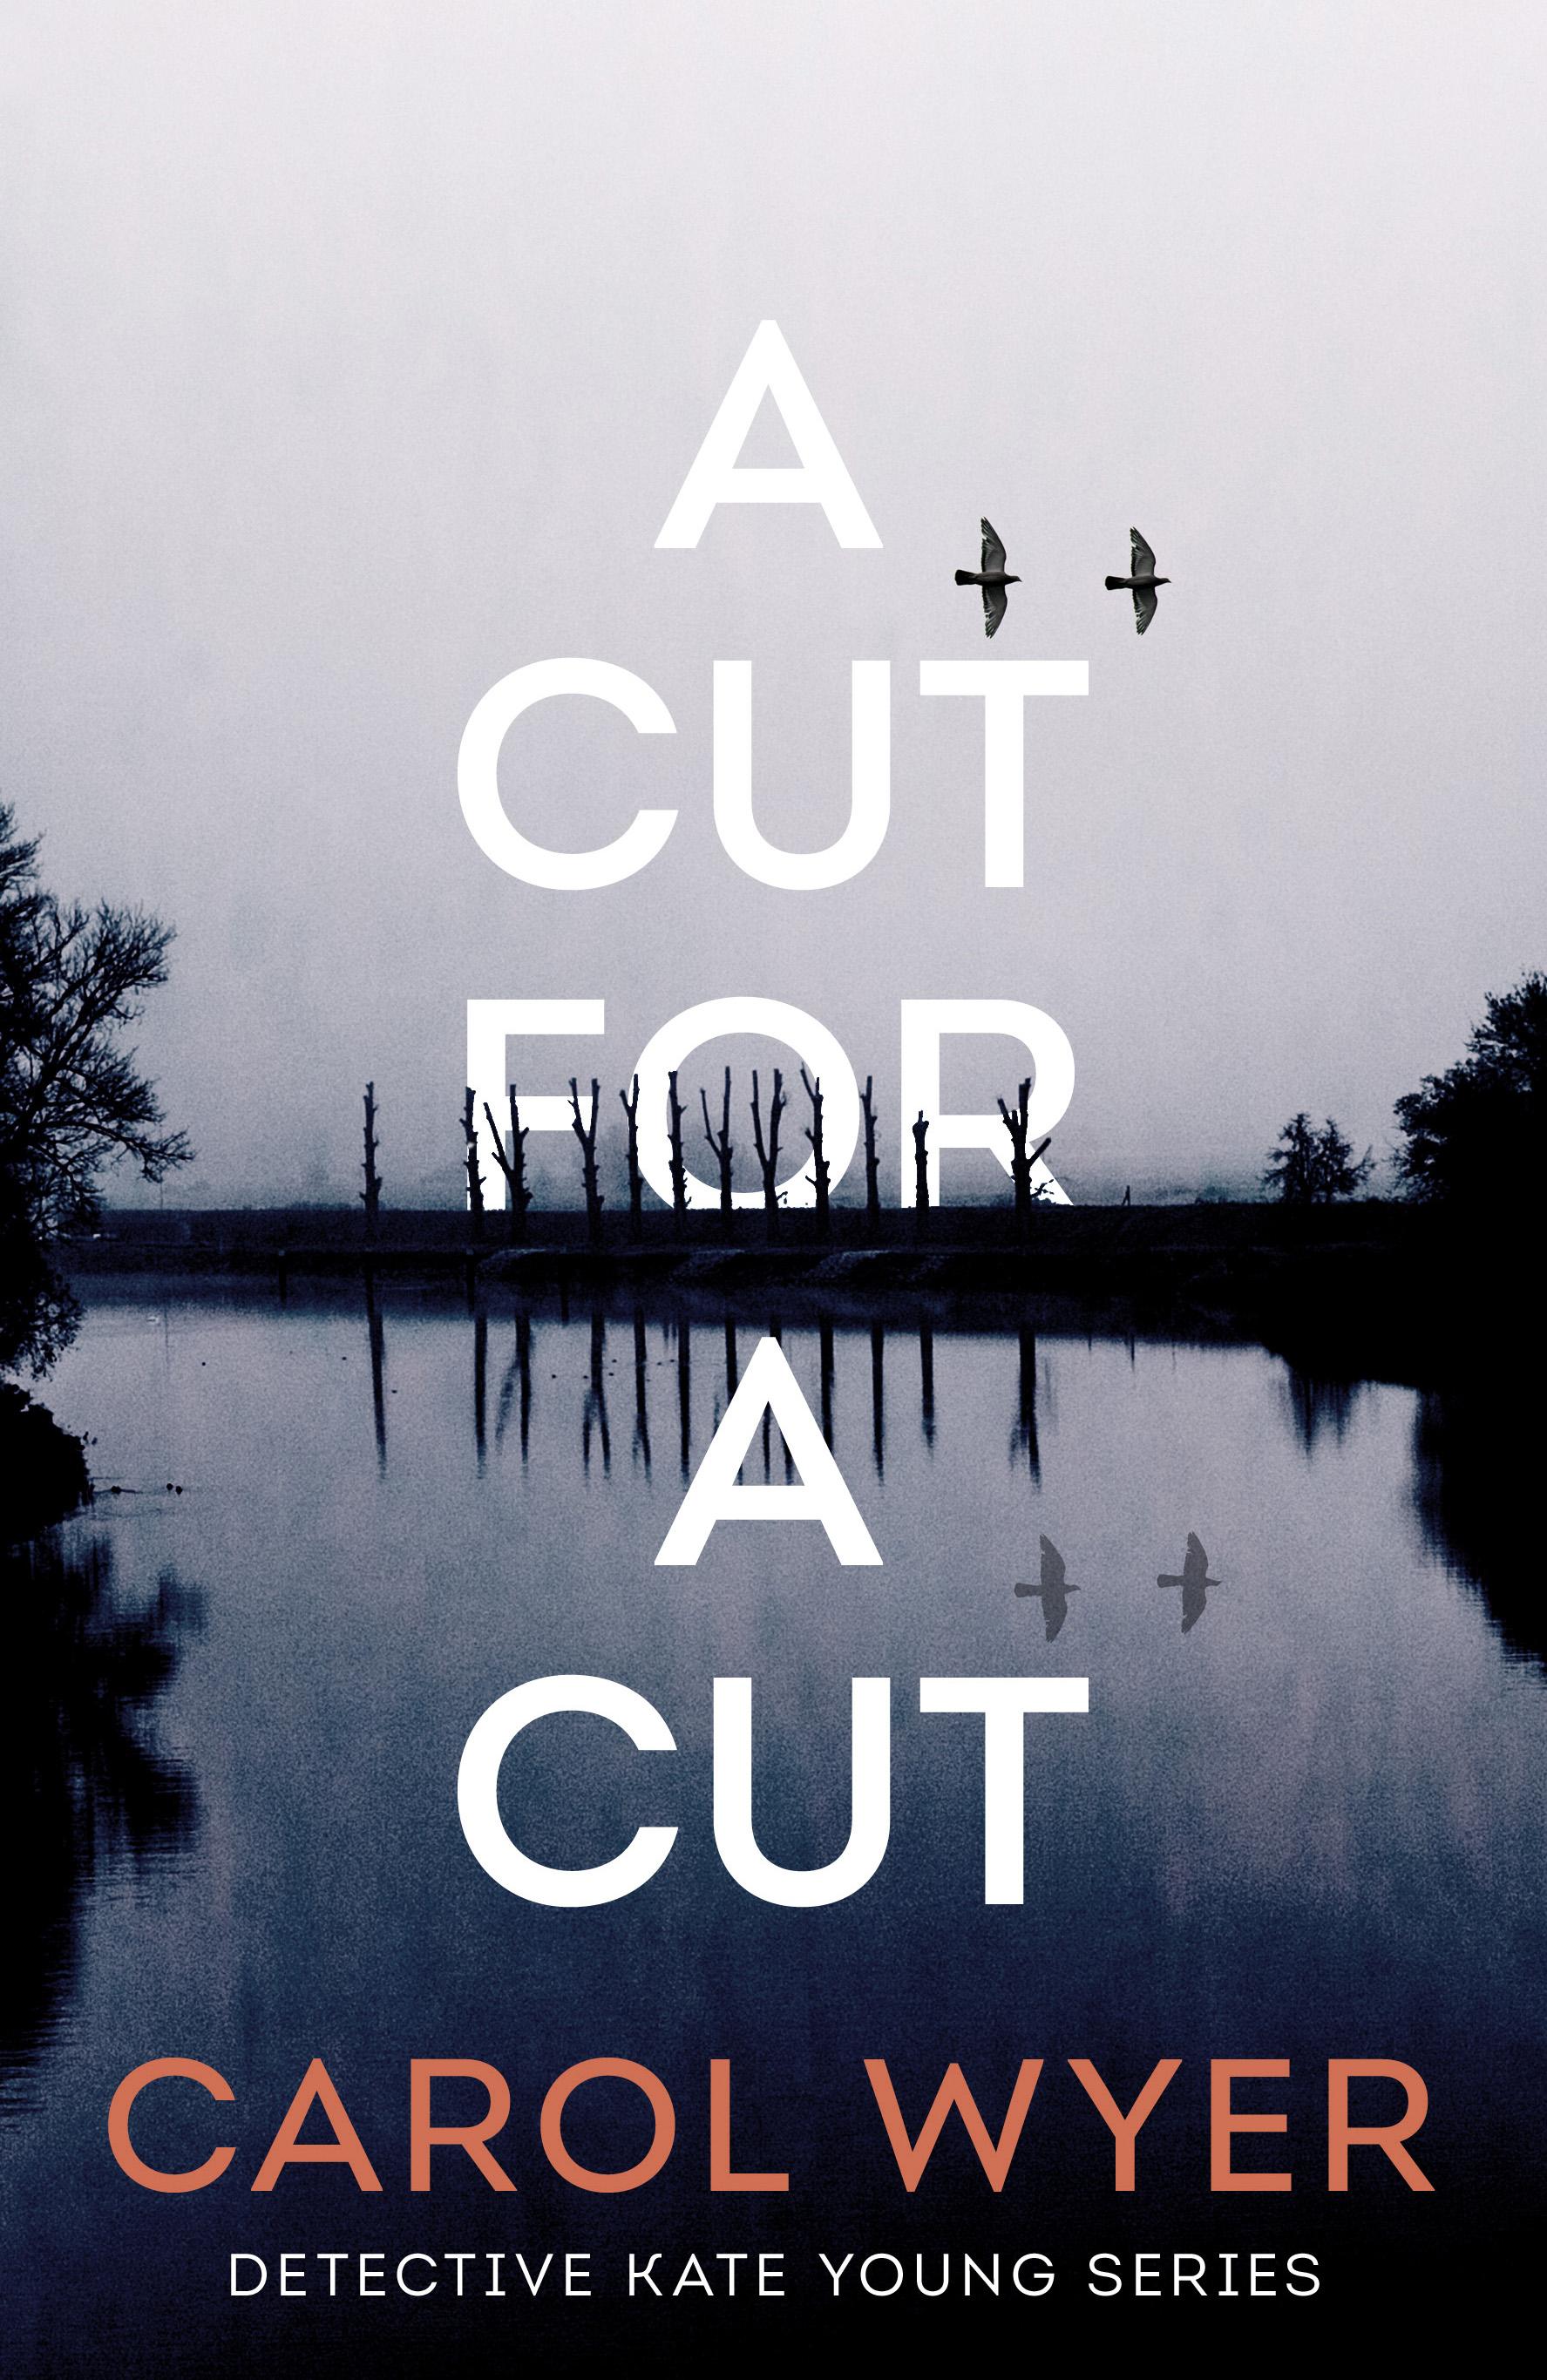 Wyer-ACutforaCut-29251-FT-v1